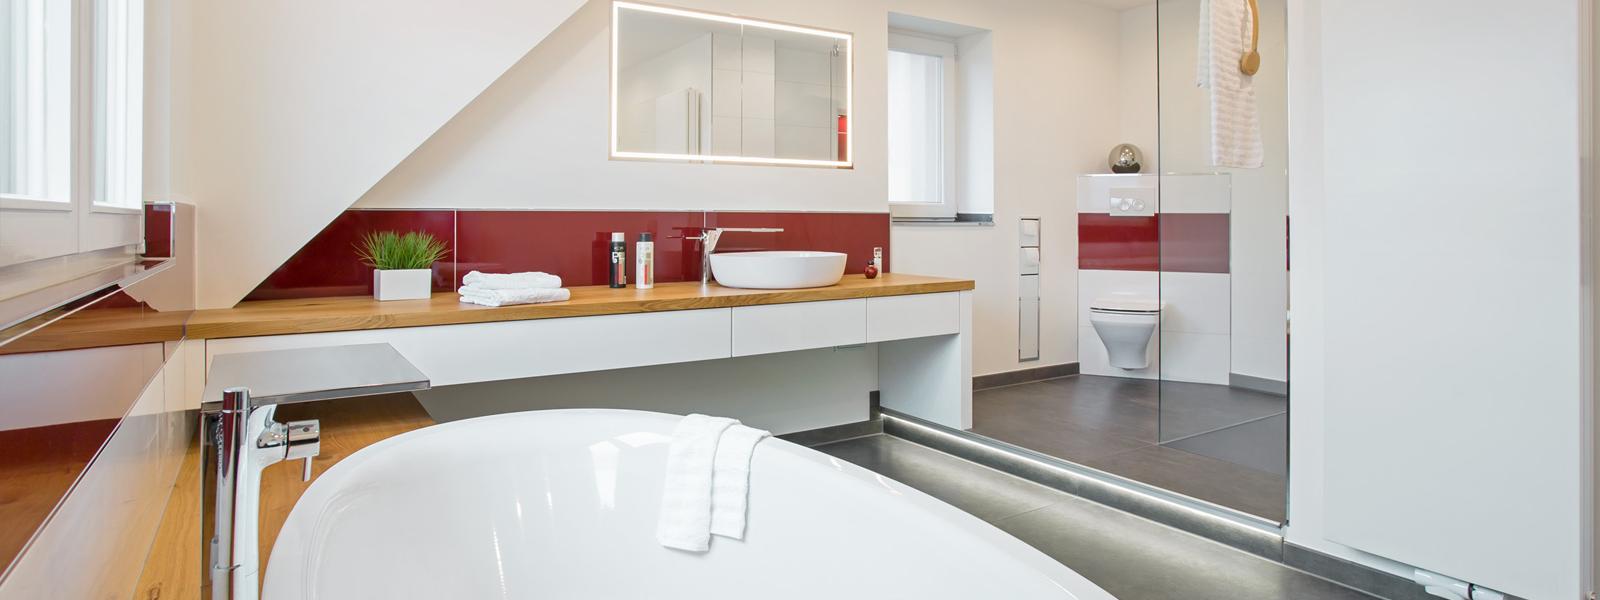 musculus badgestaltung in bergisch gladbach. Black Bedroom Furniture Sets. Home Design Ideas